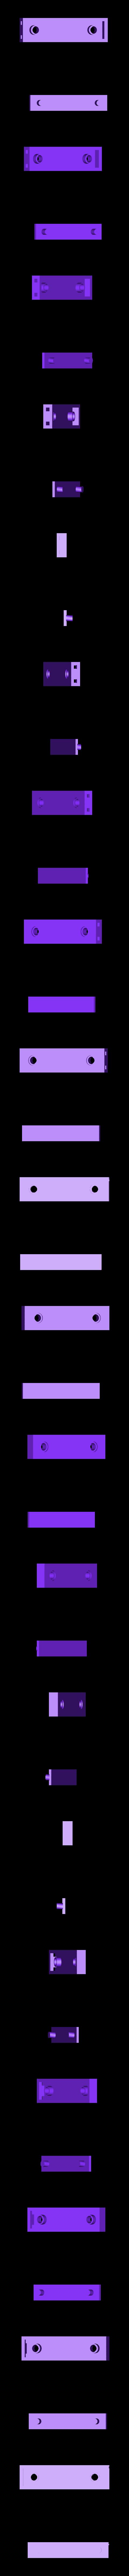 zip-fix-all.stl Download free STL file Zip-Fix (replacement zipper tab or tag system) • 3D printable model, Khuxtan